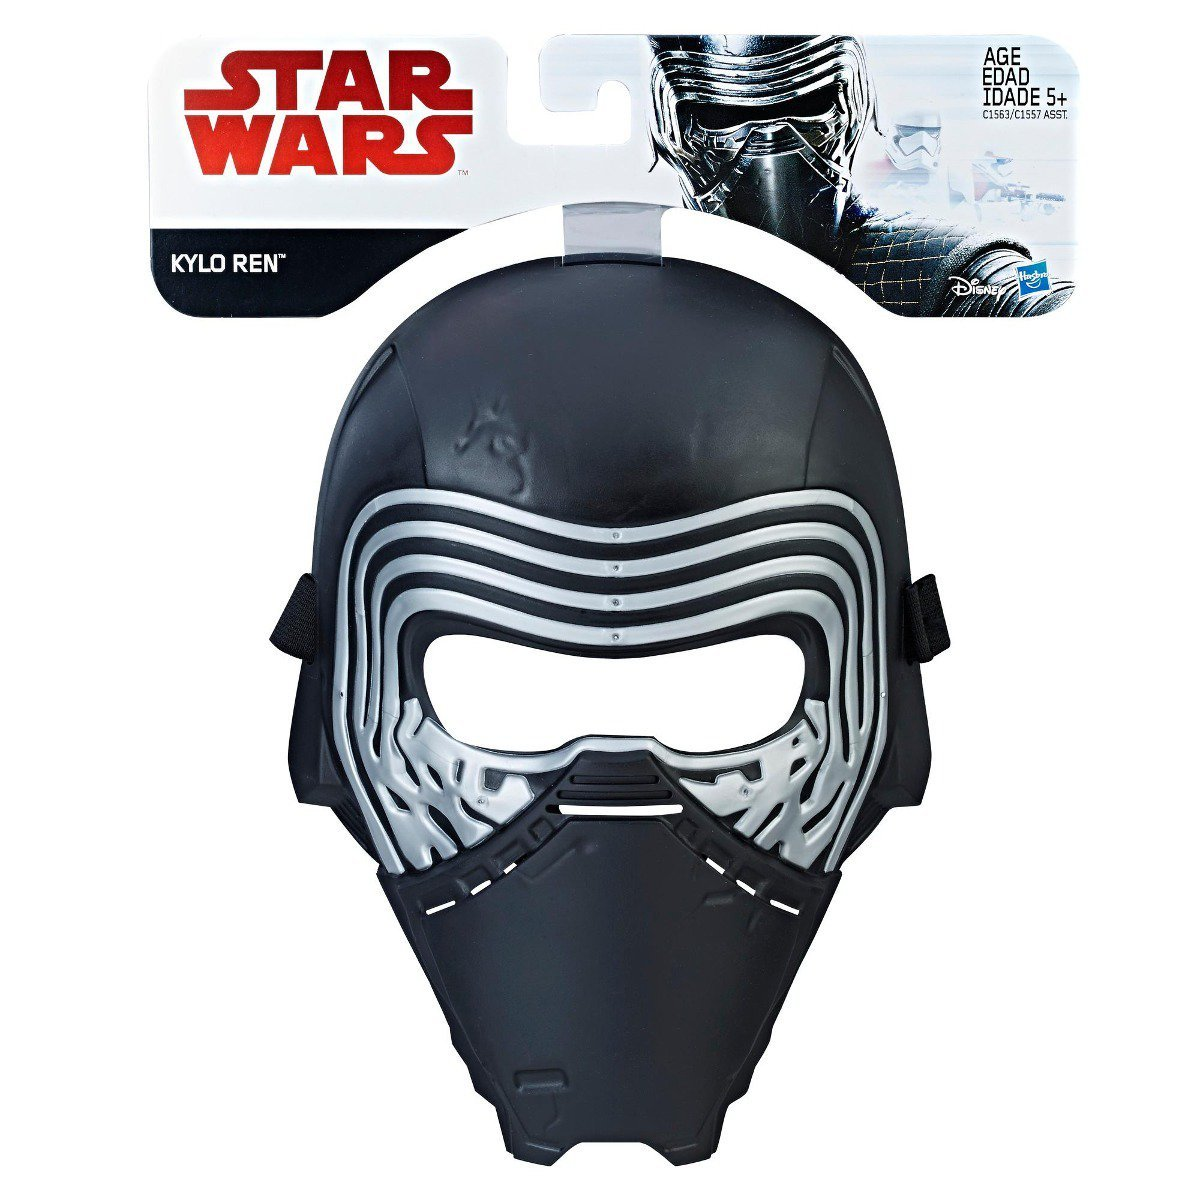 Máscara Star Wars Kylo Ren Os Últimos Jedi - Hasbro C1563